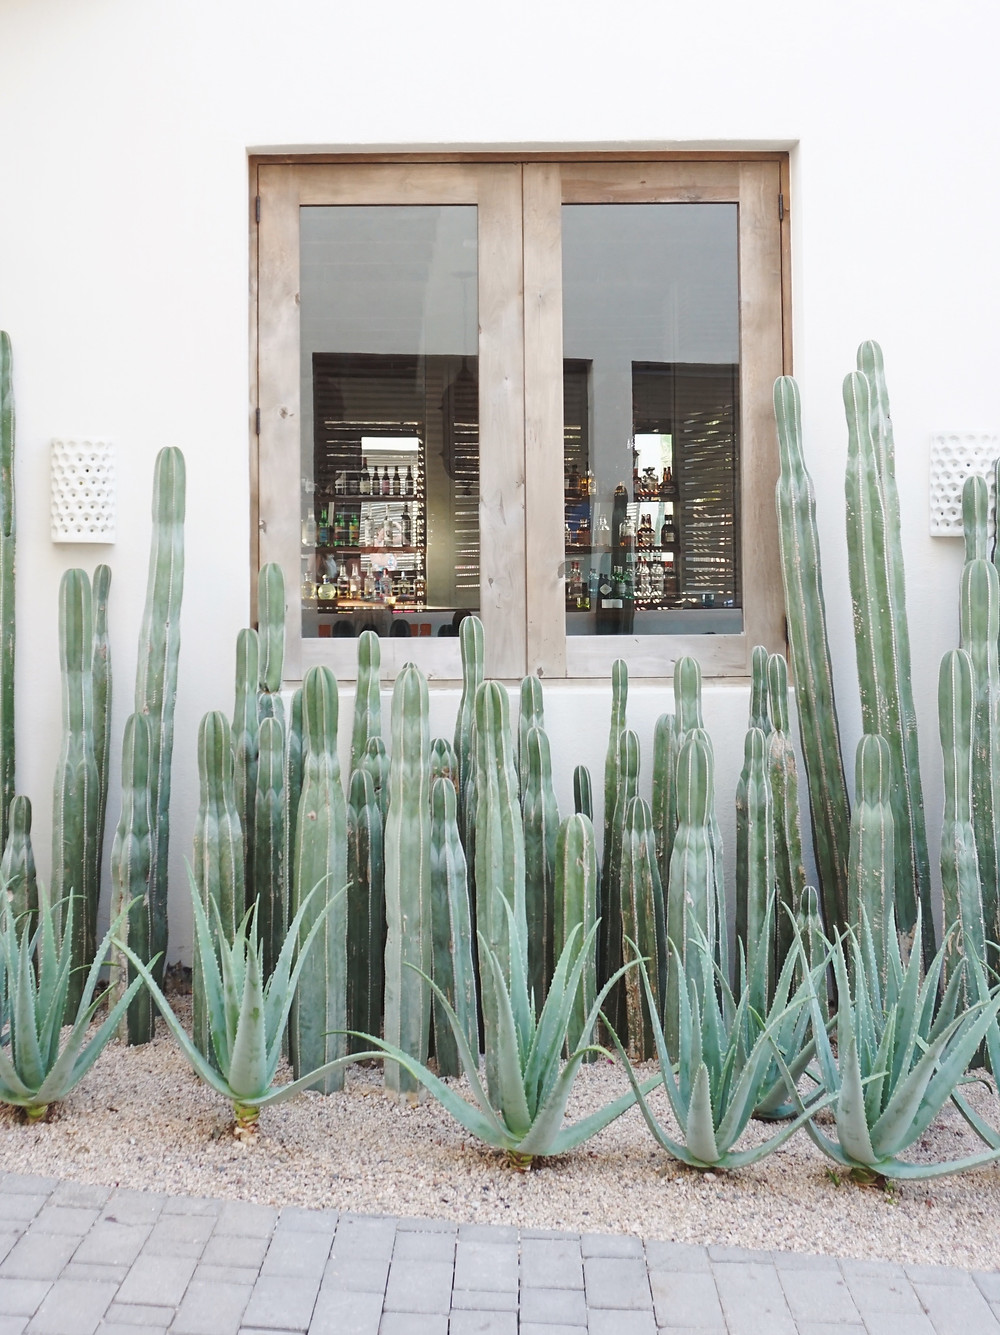 The Beautiful Cacti greeted us at San Cristobal in Todos Santos